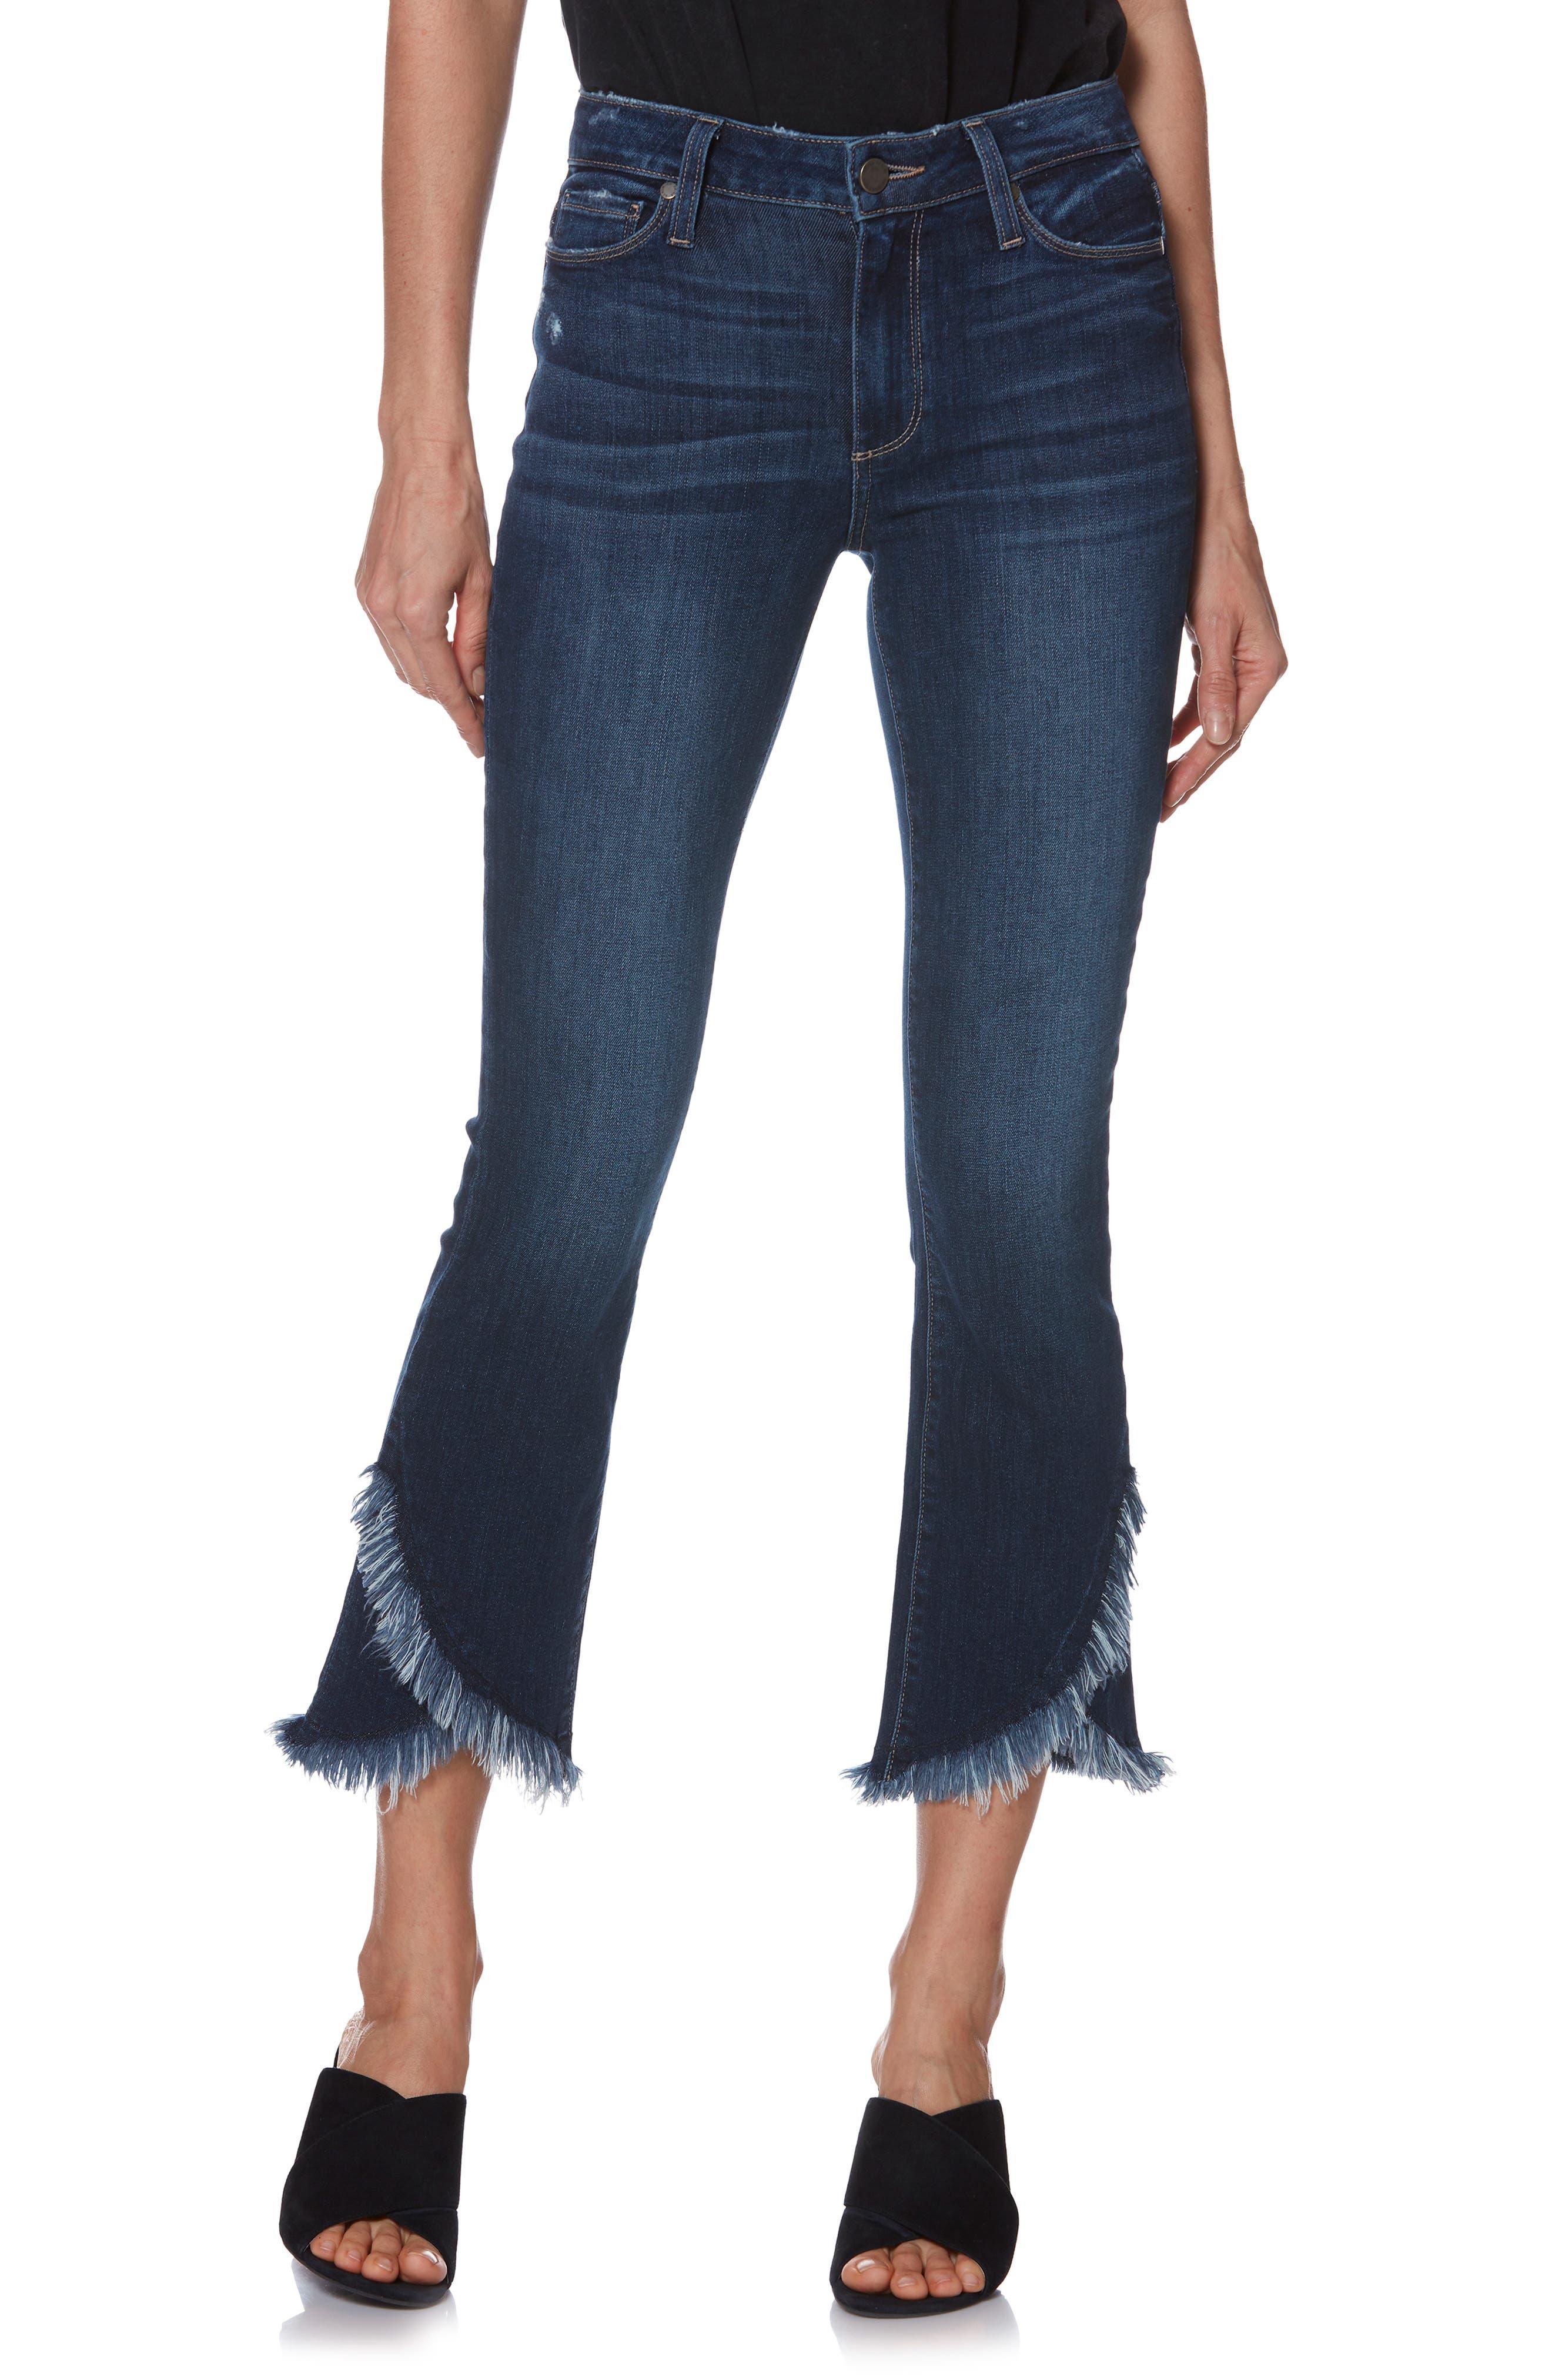 PAIGE Transcend Vintage - Colette Frayed Crop Flare Jeans, Main, color, PALMA